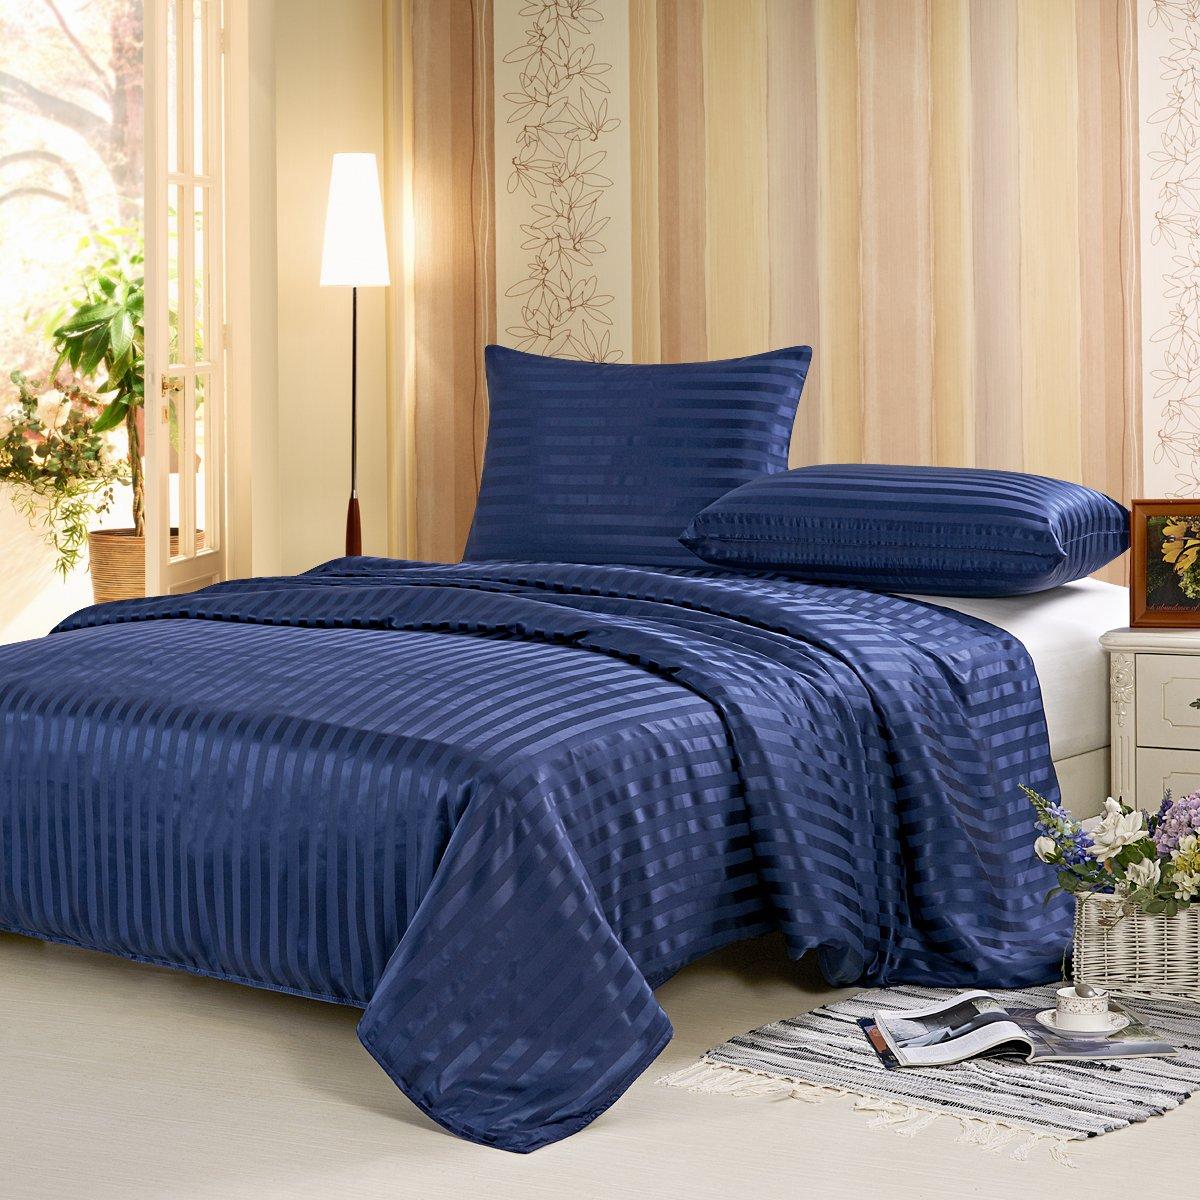 ALASKA BEAR - Mulberry Silk Seamless Duvet Cover with Hidden Zipper Closure, Hypoallergenic Comforter Cover(King, Navyblue Stripe)